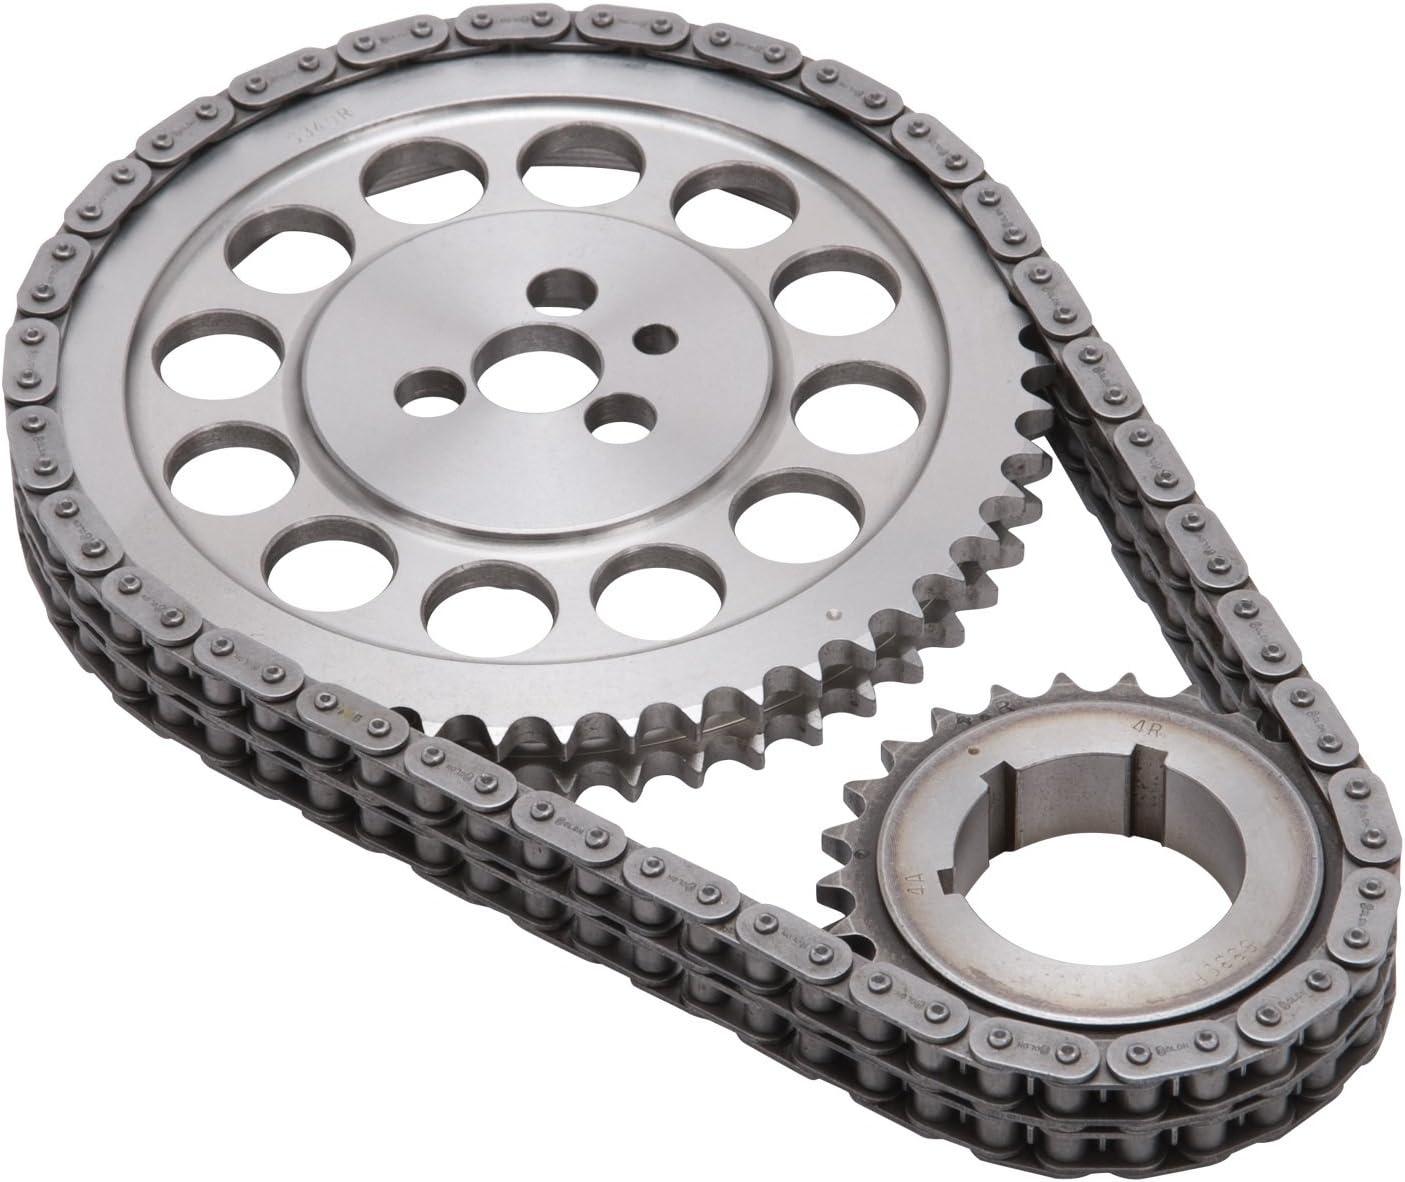 Edelbrock 7805 Performer-Link Timing Chain Set Incl Cam//Crank Sprocket//Chain 3 Bolt Performer-Link Timing Chain Set